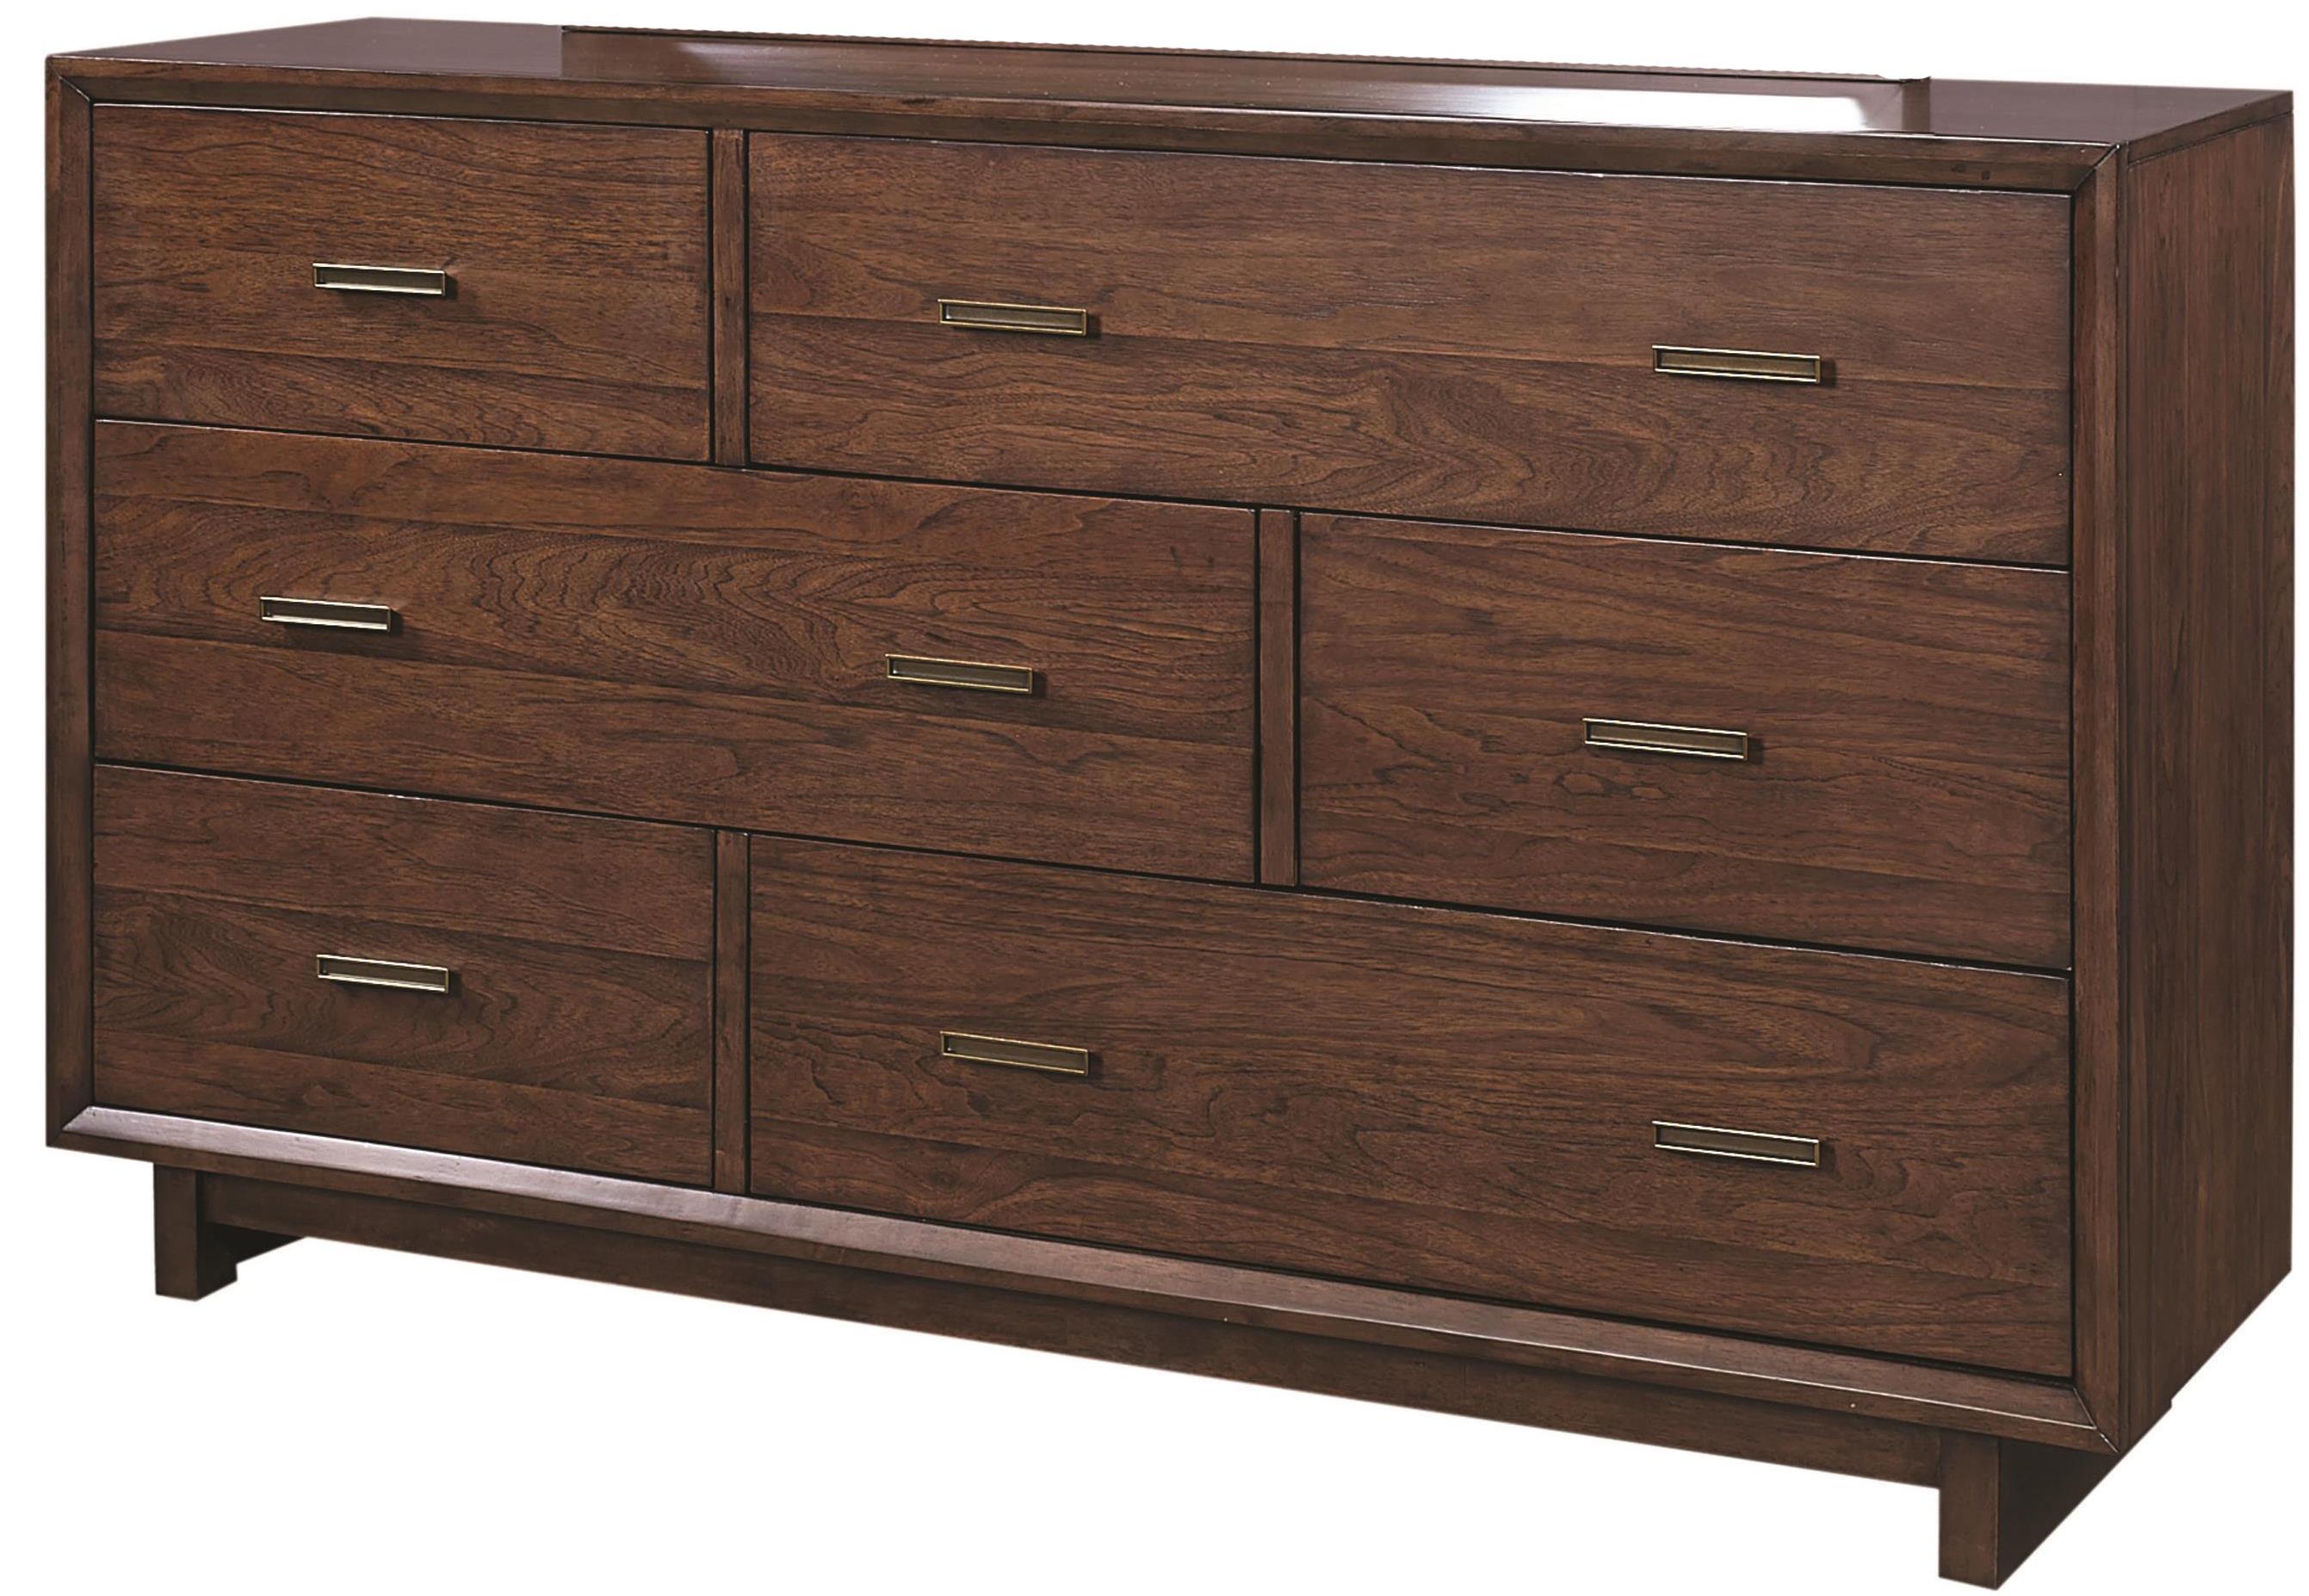 "Aspenhome Walnut Heights 62"" Asymmetrical Dresser  - Item Number: IWH-453"